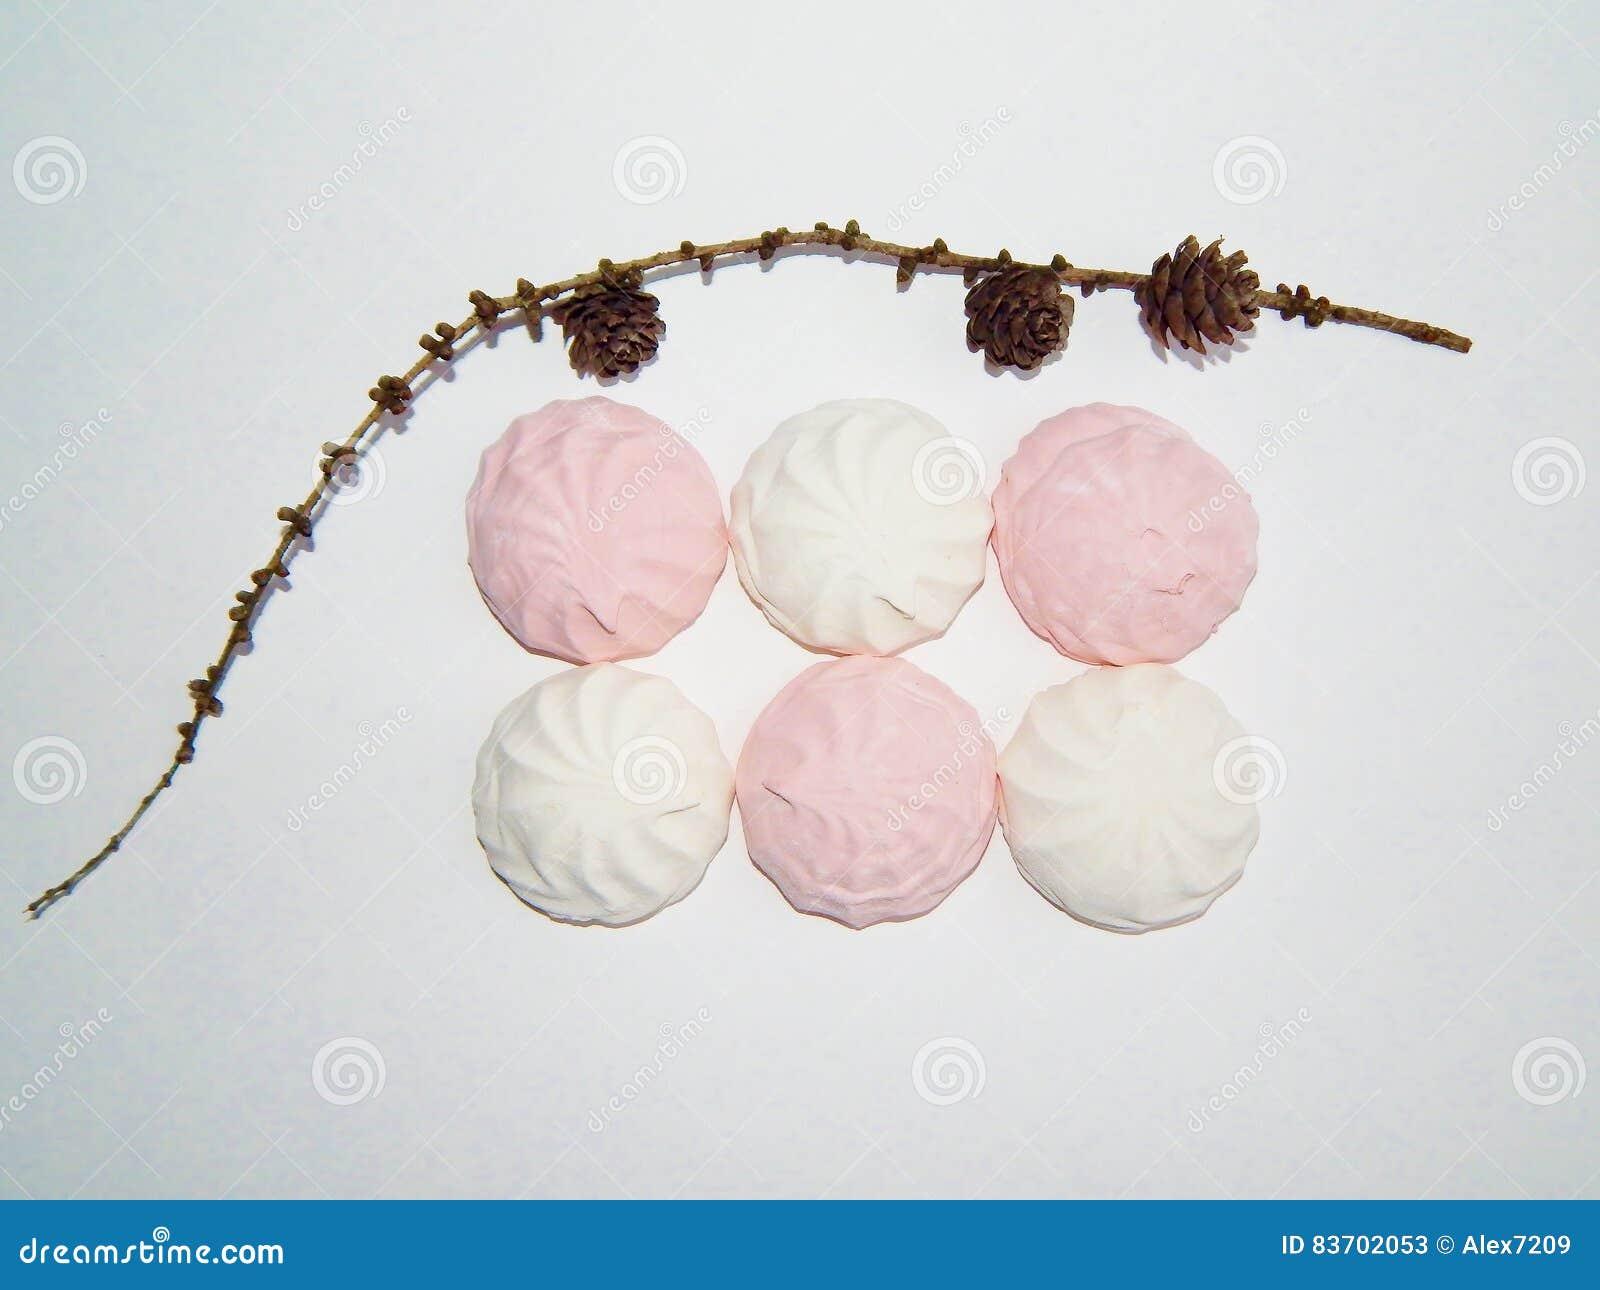 Marshmallow, Meringue,zephyr Stock Photo